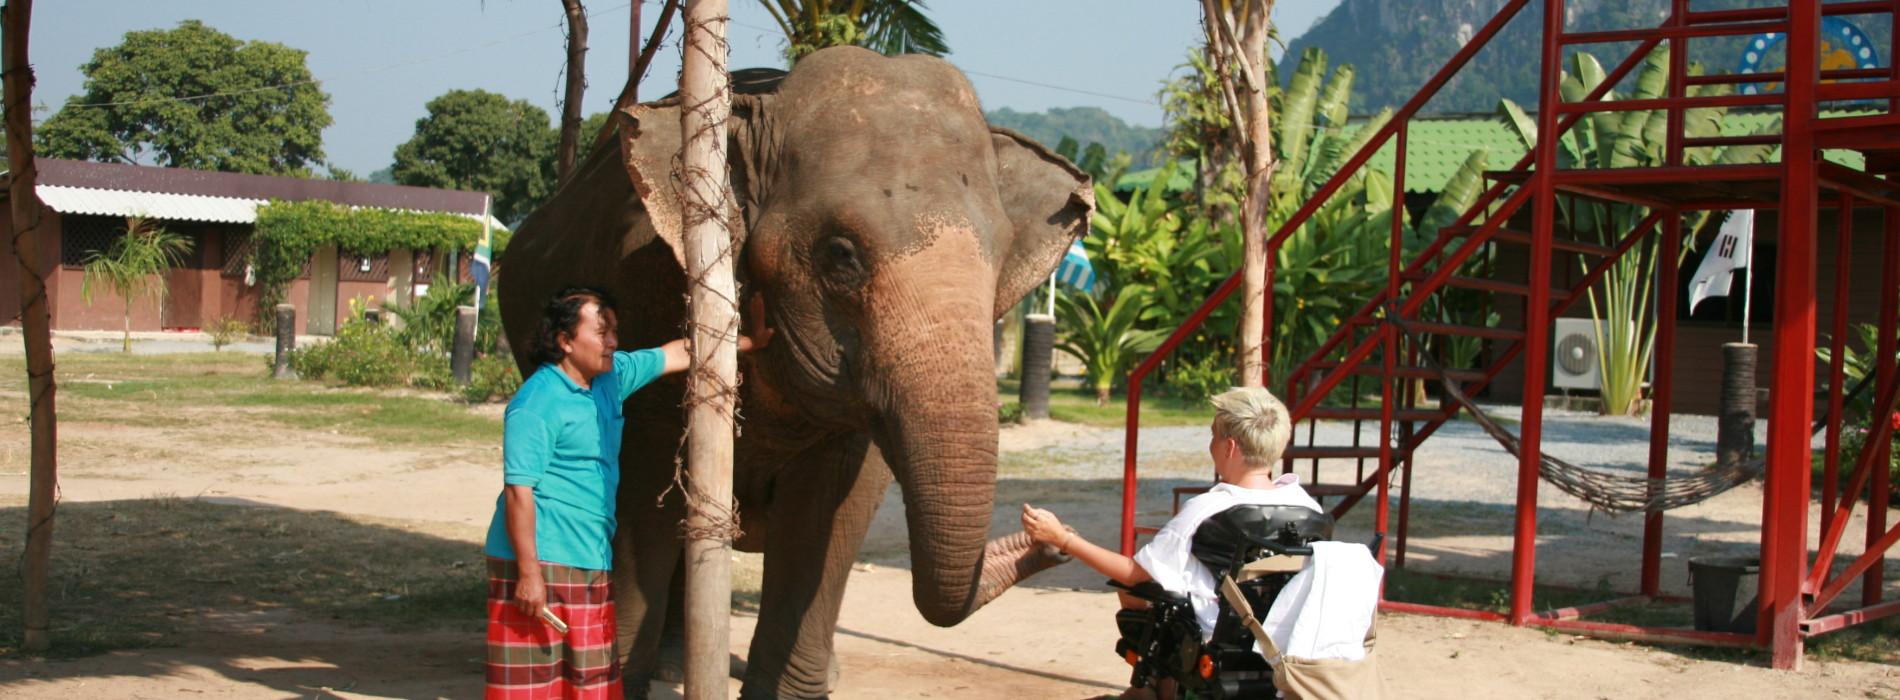 My incredible trip through Thailand (via Oman!)